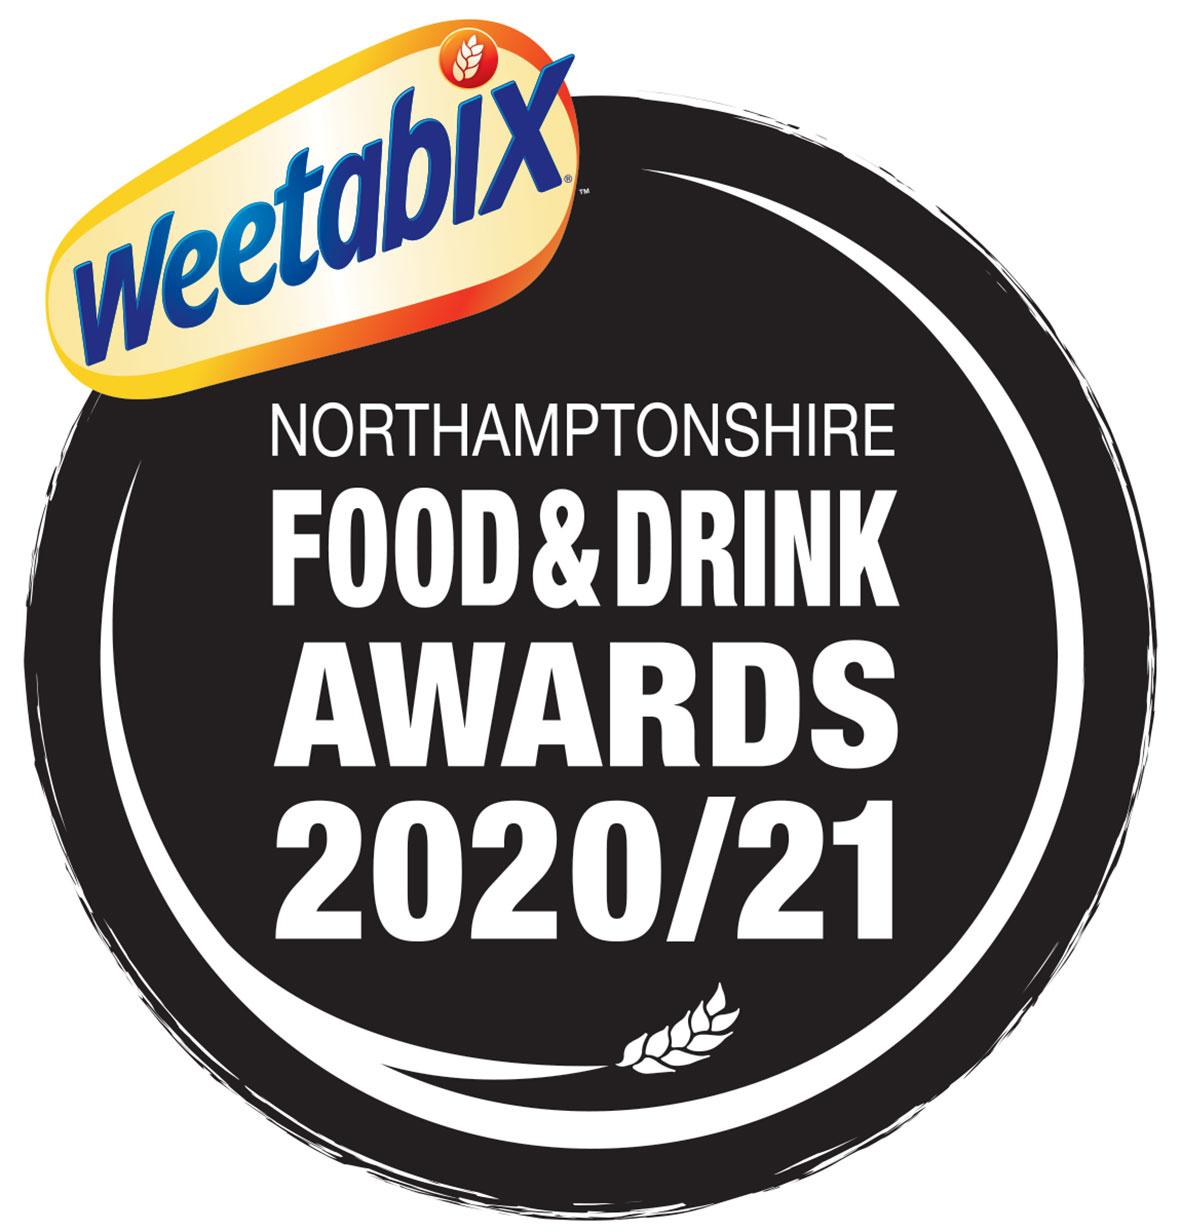 Weetabix Northamptonshire Food and Drink Awards logo